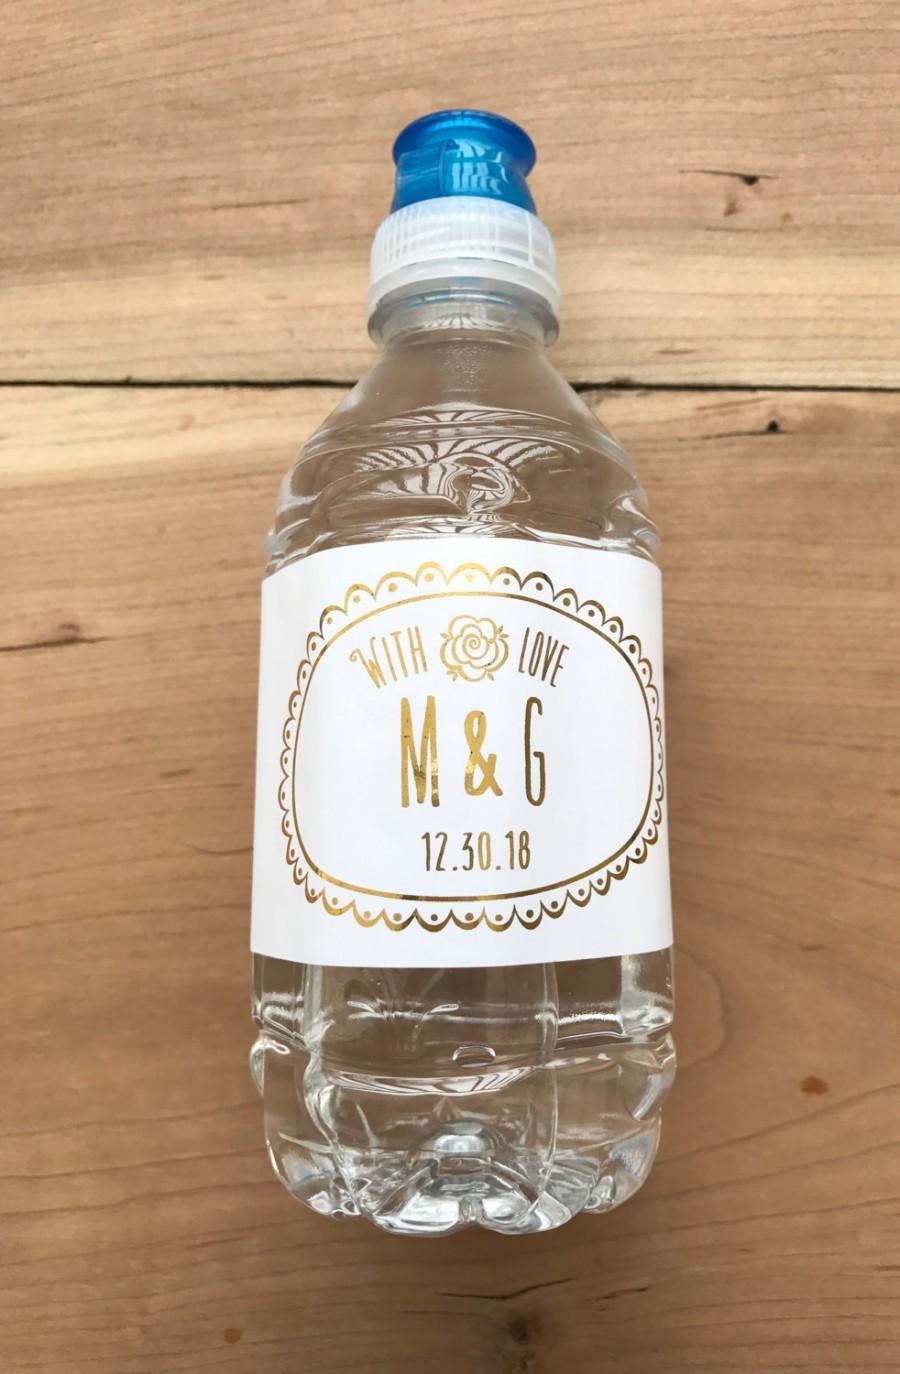 b0bcb1a5eb07 Gold Foil Waterproof Water Bottle Labels - Silver Foil Metallic ...